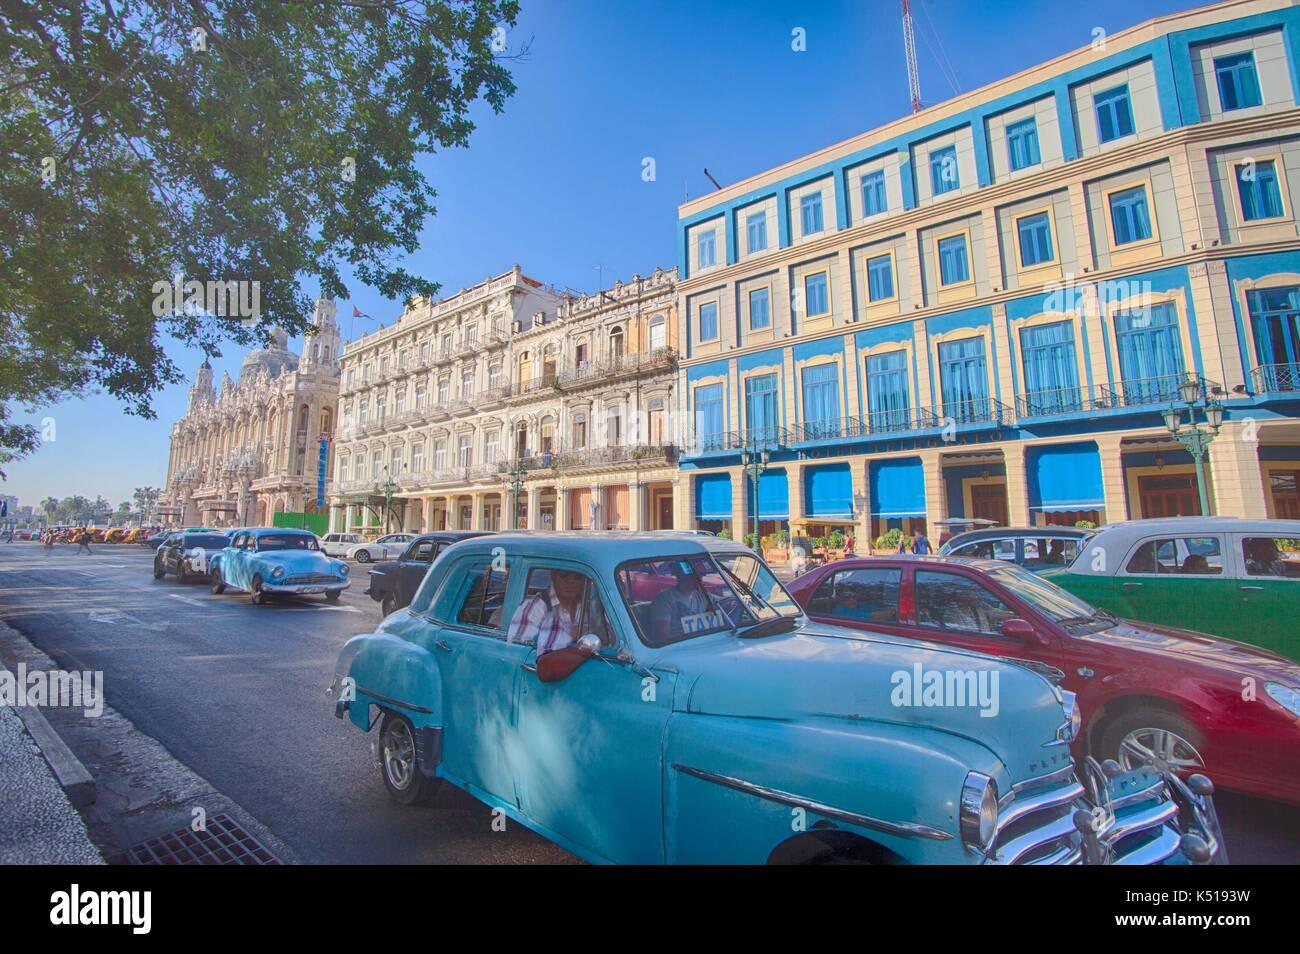 Old car, Havana, Cuba - Stock Image